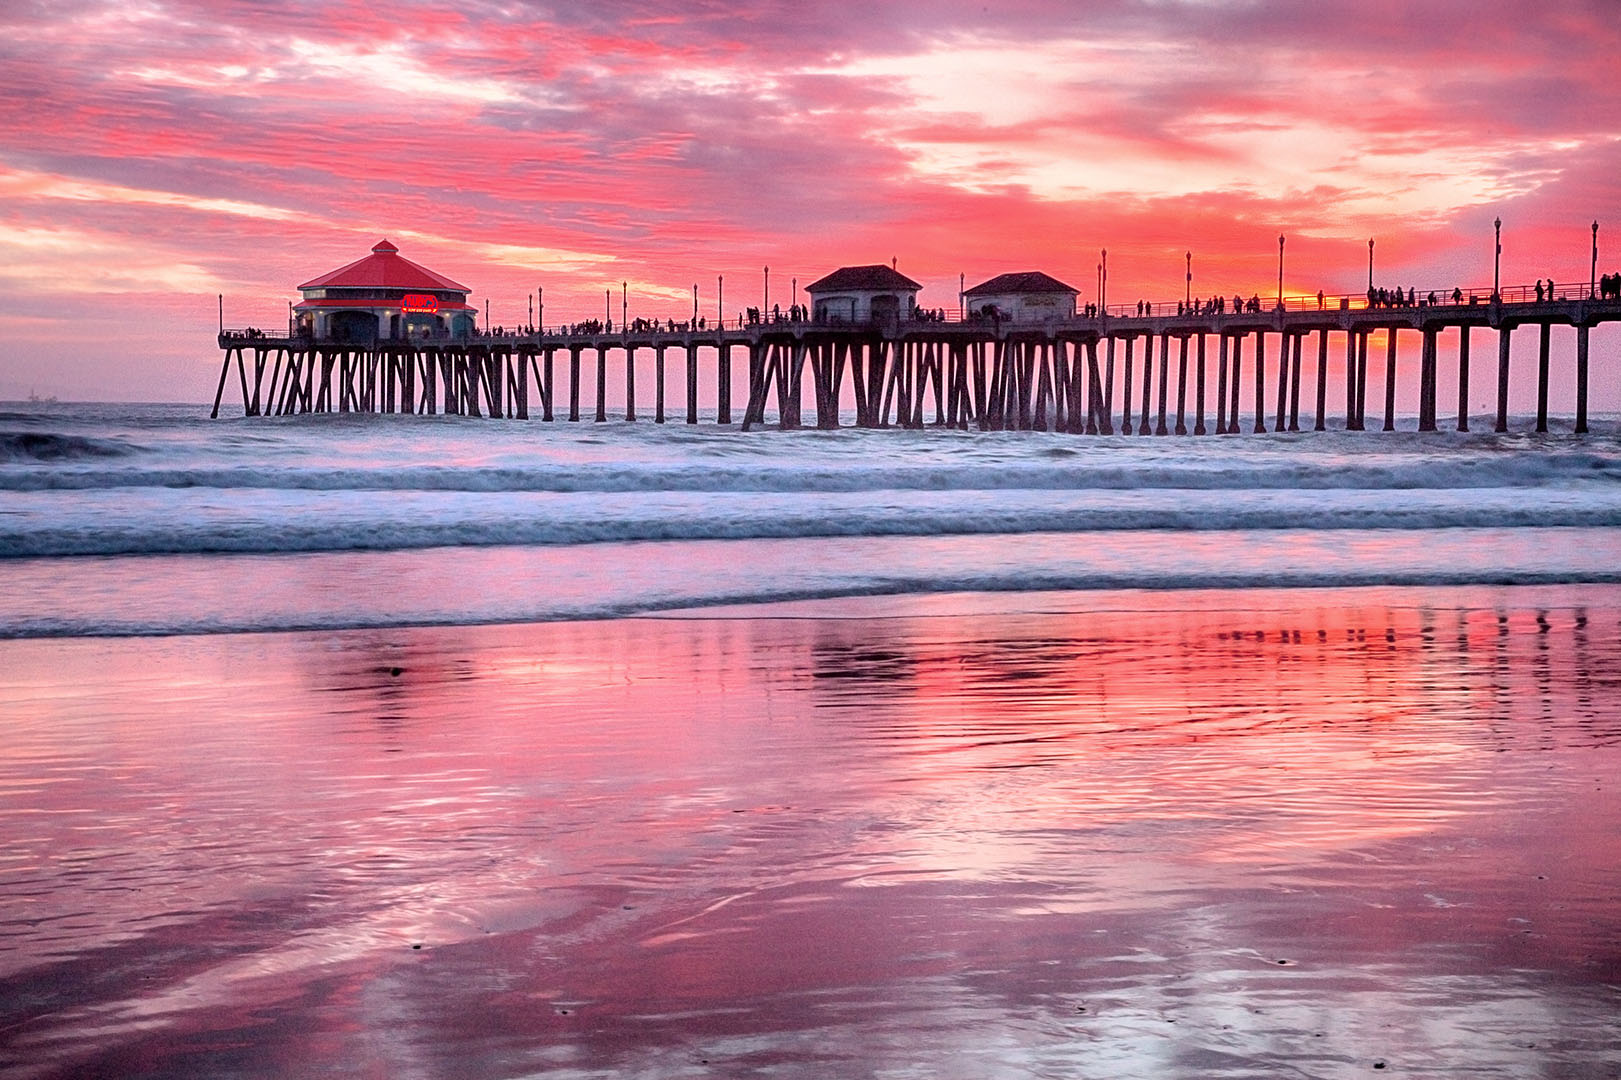 Red Pier Sunset